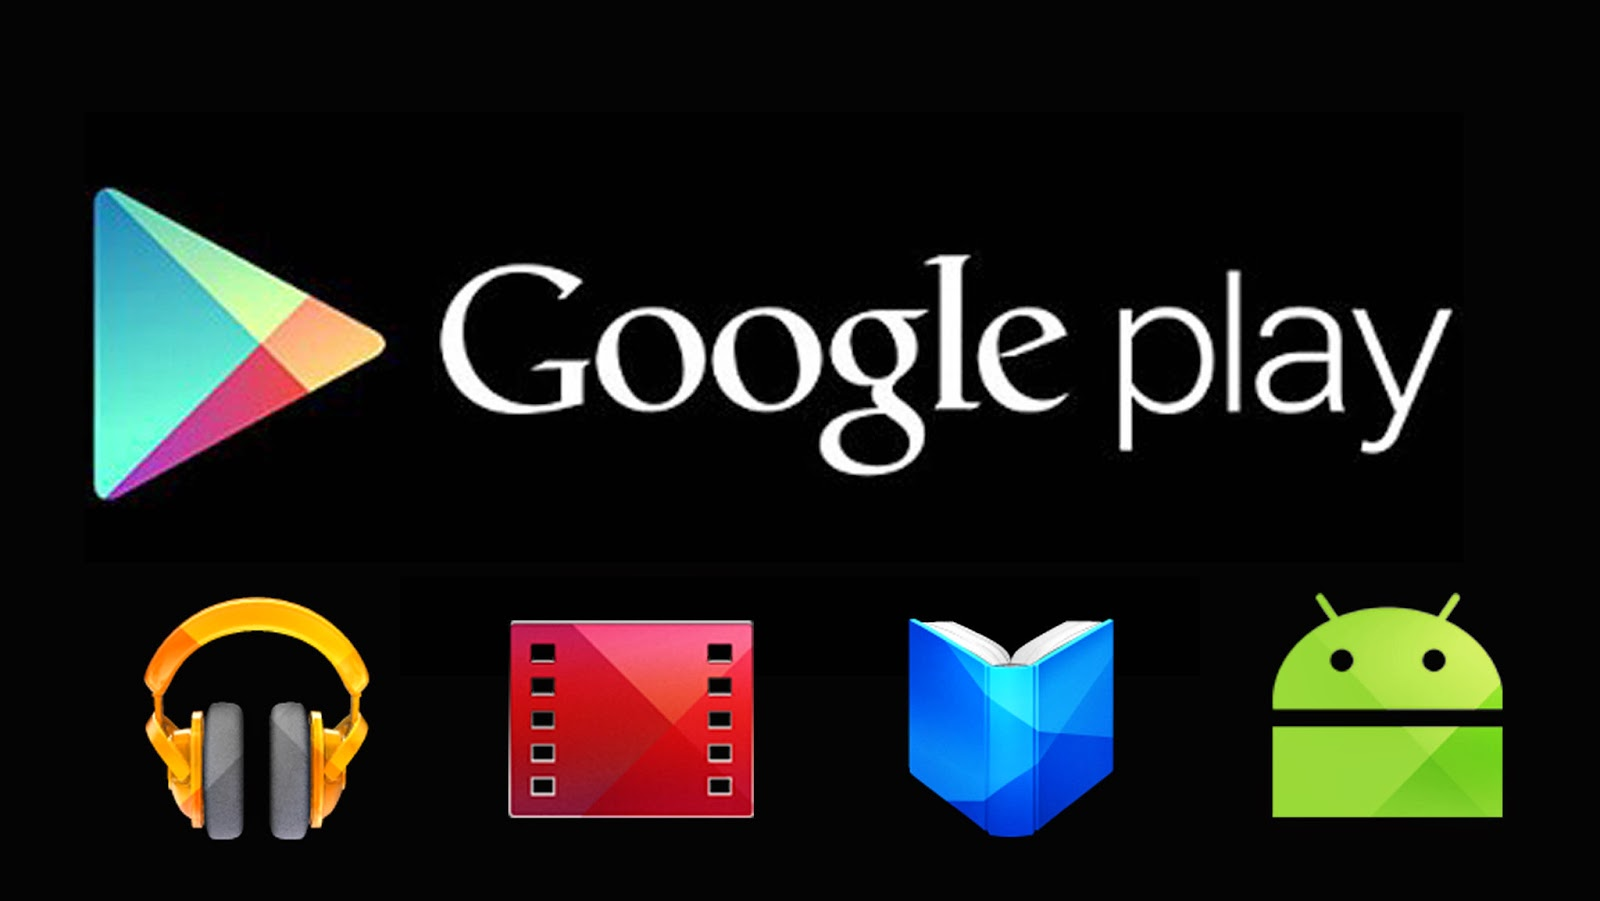 Aplikasi Android Keren, Unik, dan Wajib Dimiliki